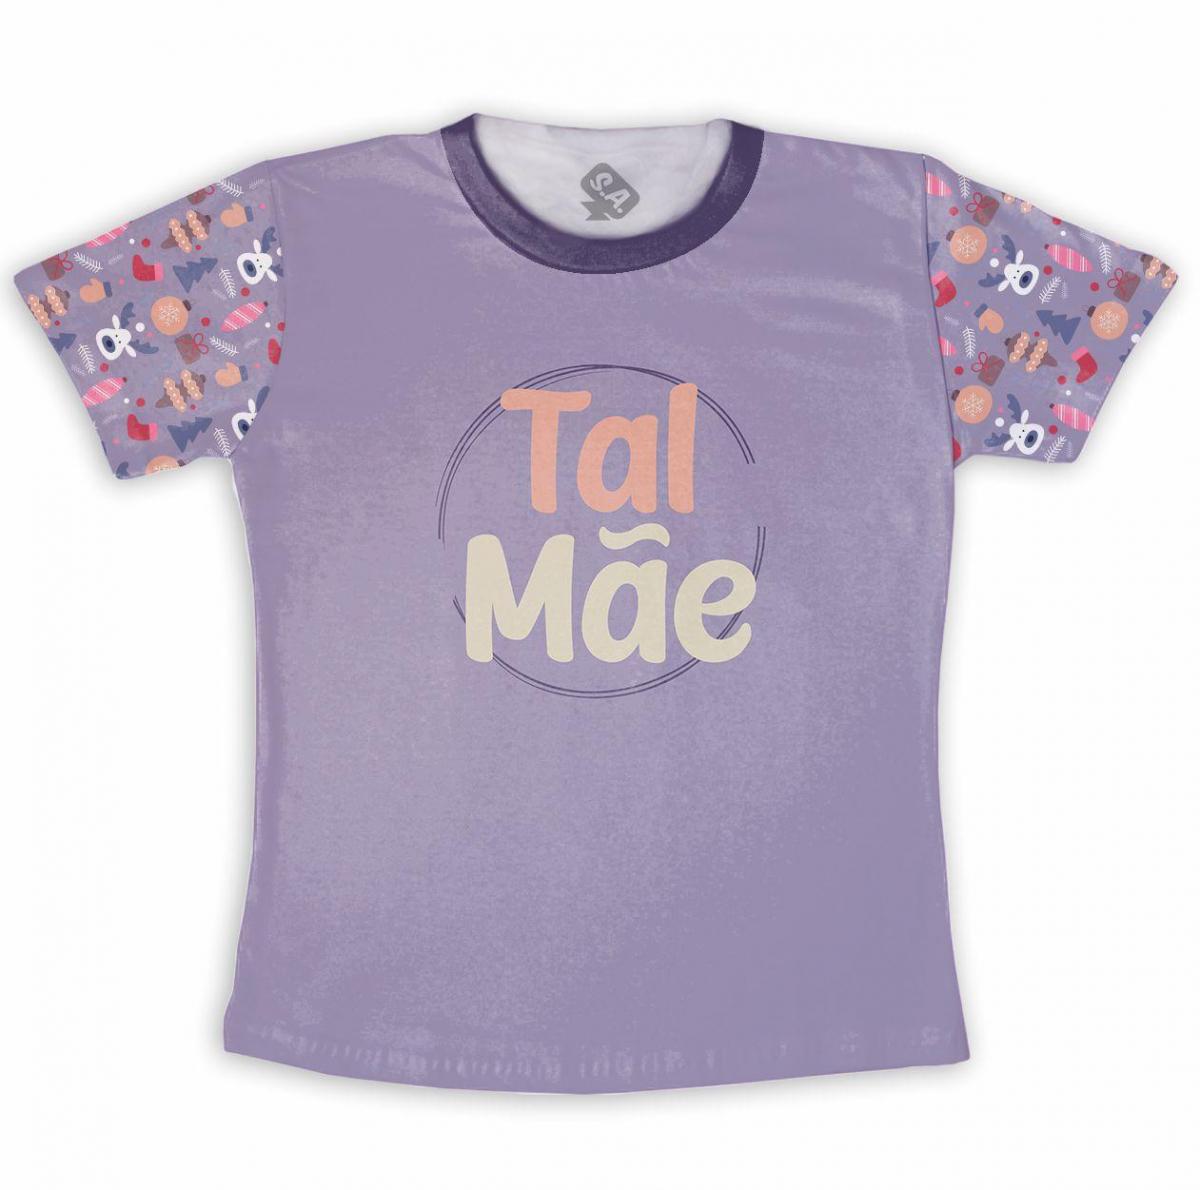 Camiseta Adulto Poliéster Estampa Total Natal  Tal Mãe